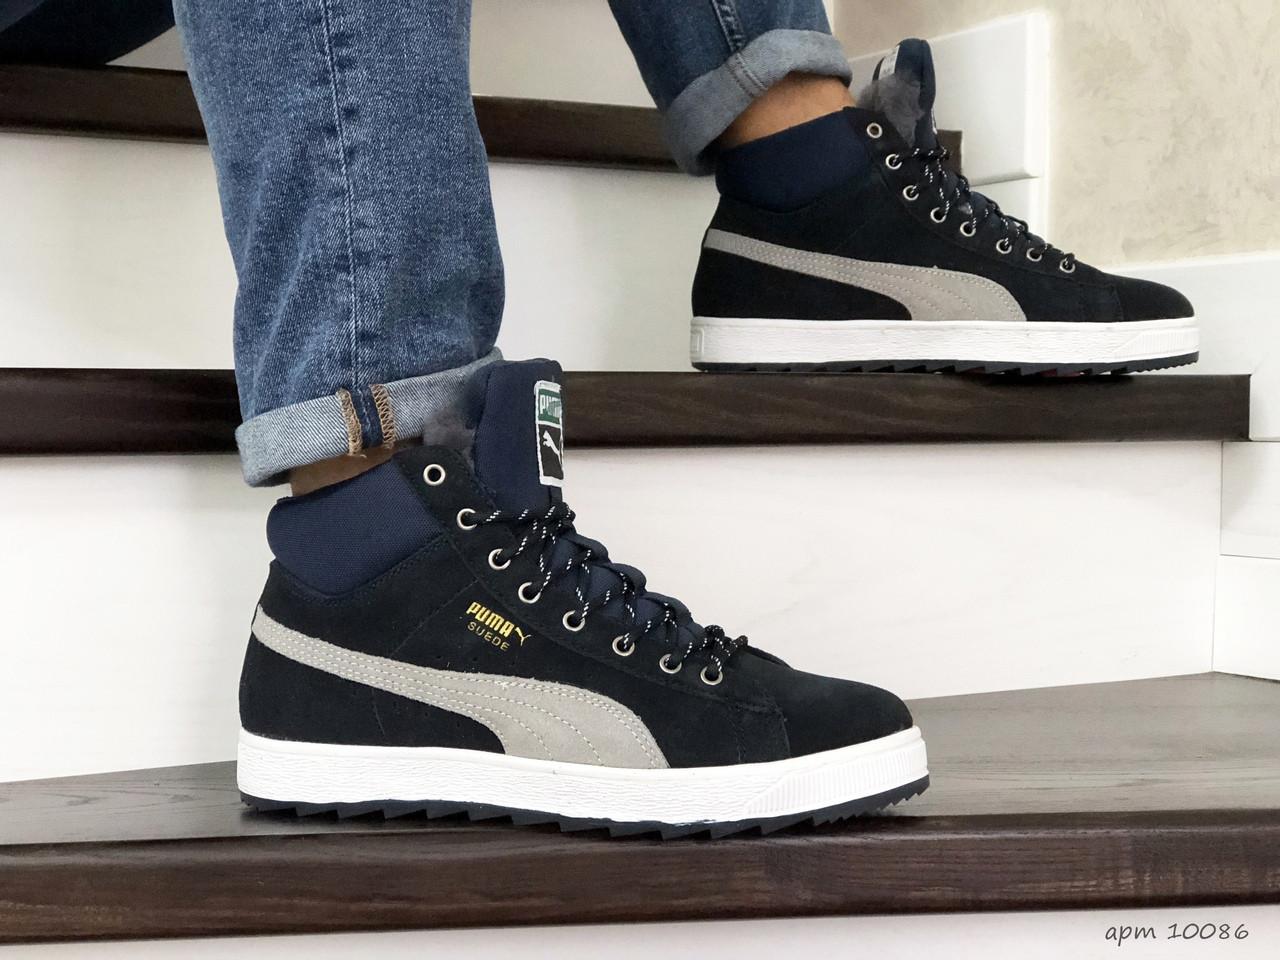 Мужские зимние кроссовки Puma Suede (темно-синие) 10086